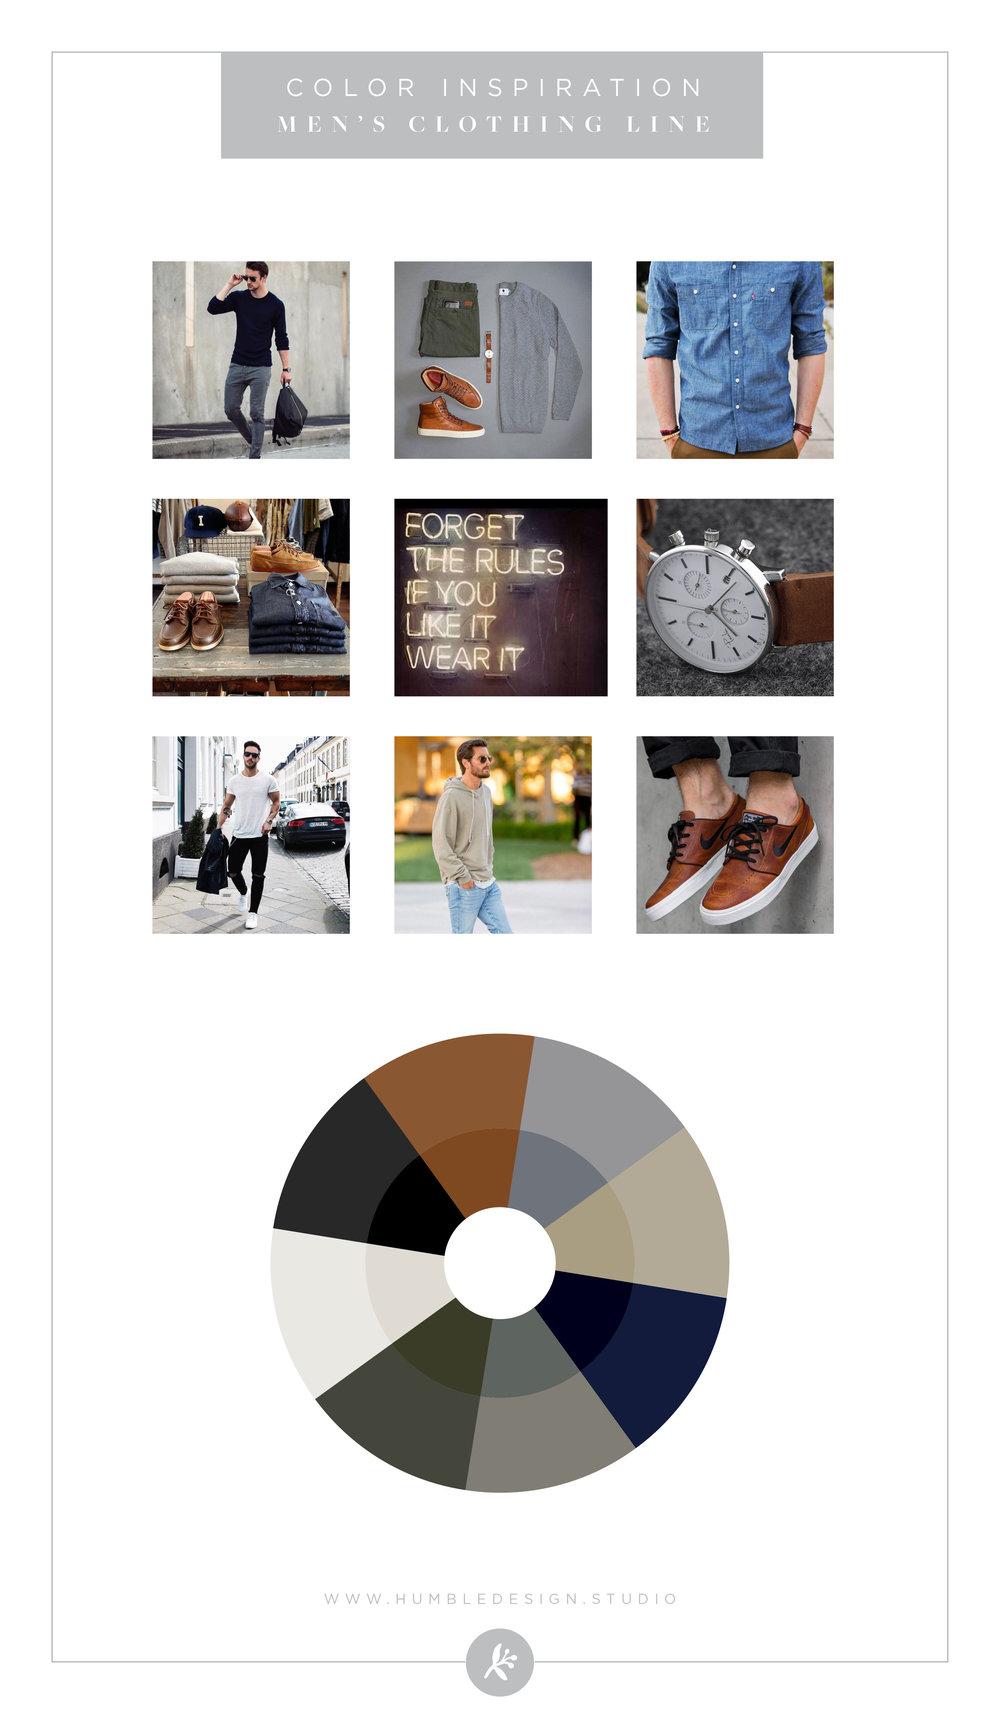 Mens clothing line color palette inspiration